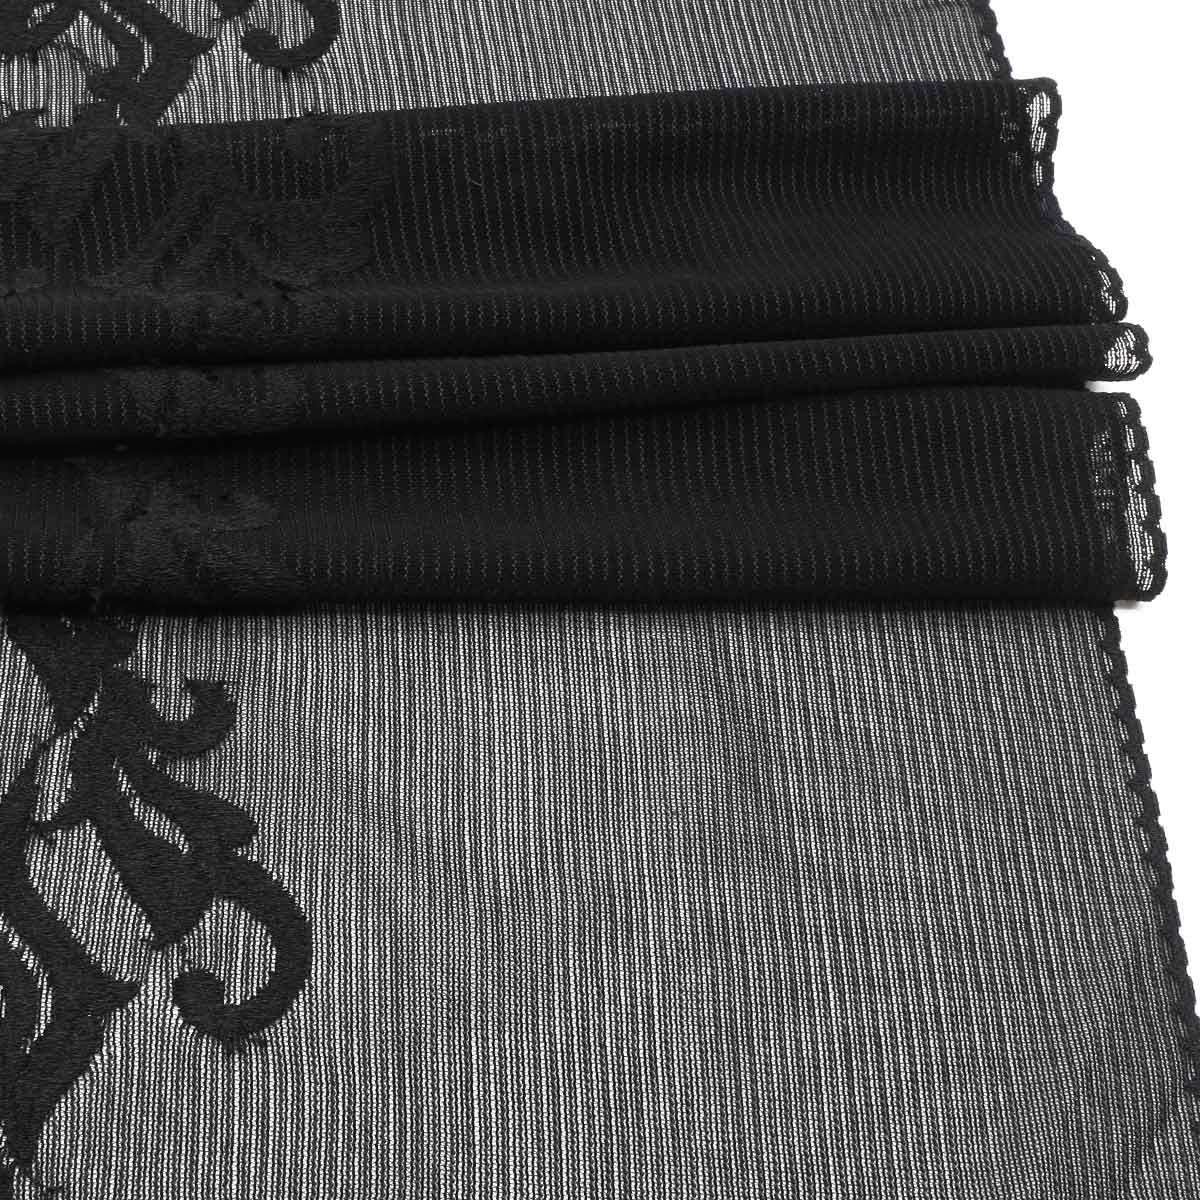 SU 6 Ткань эластичная бельевая 31 см*10